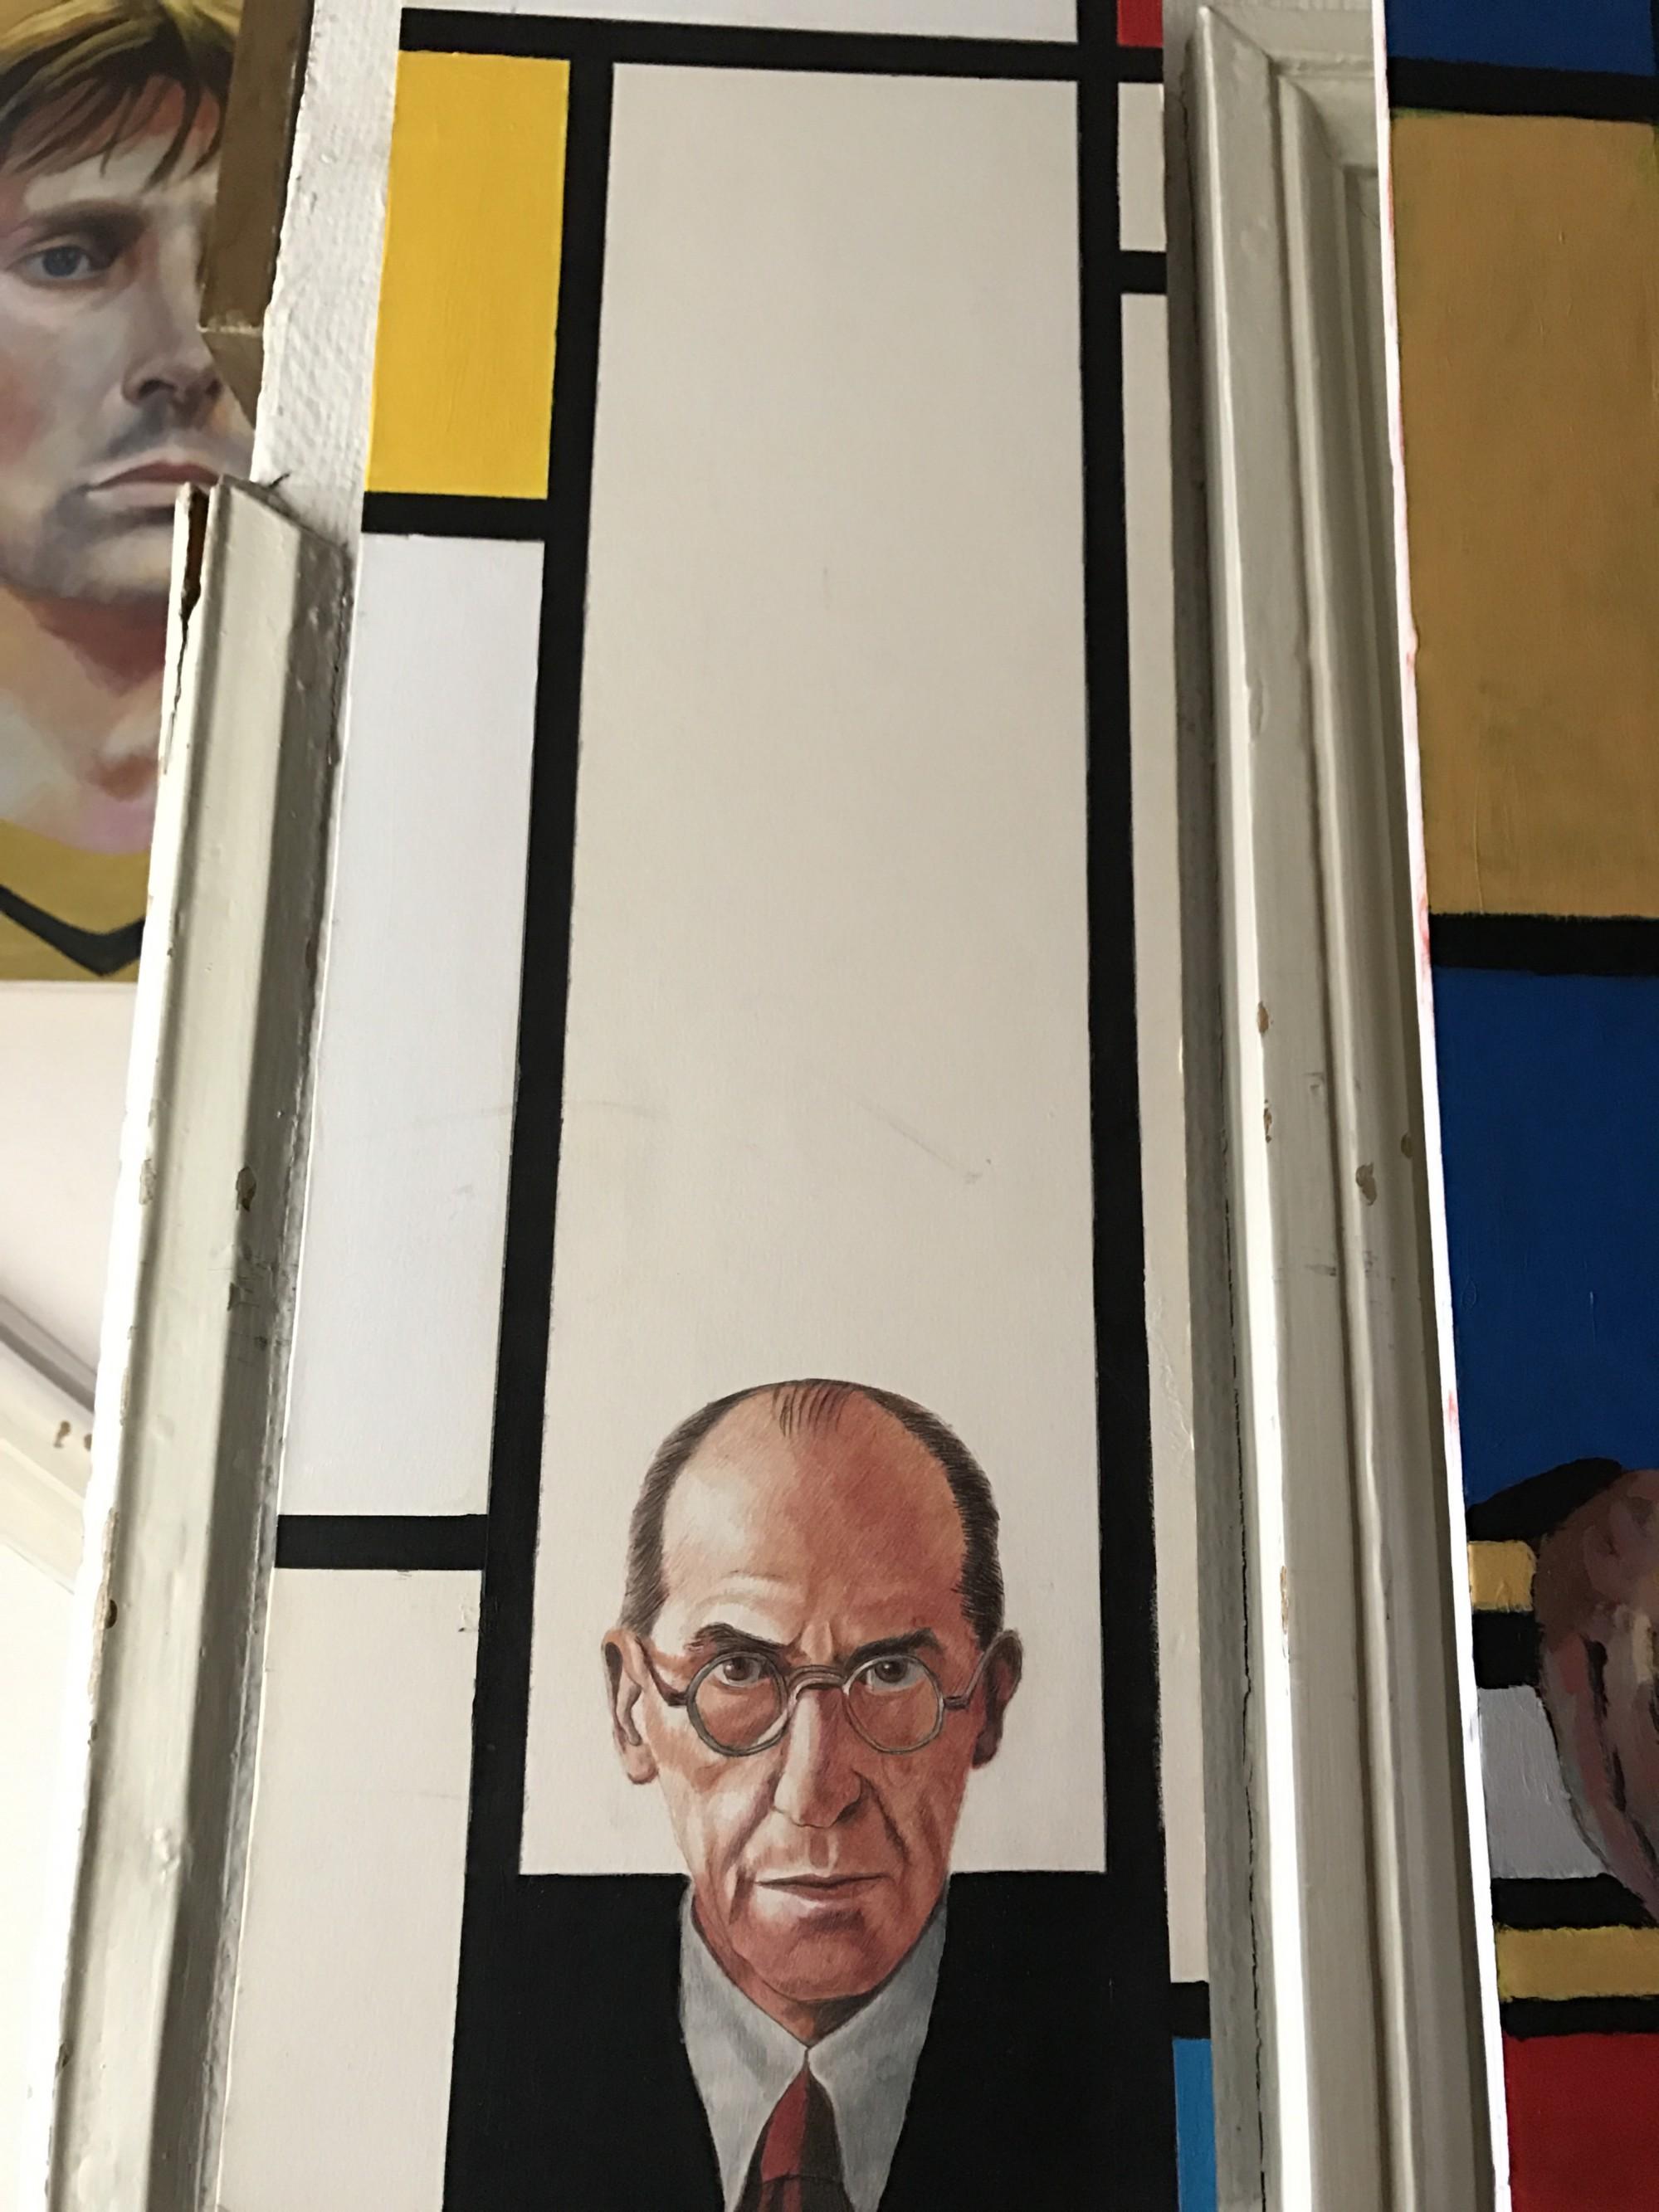 Mondriaan with a pencil